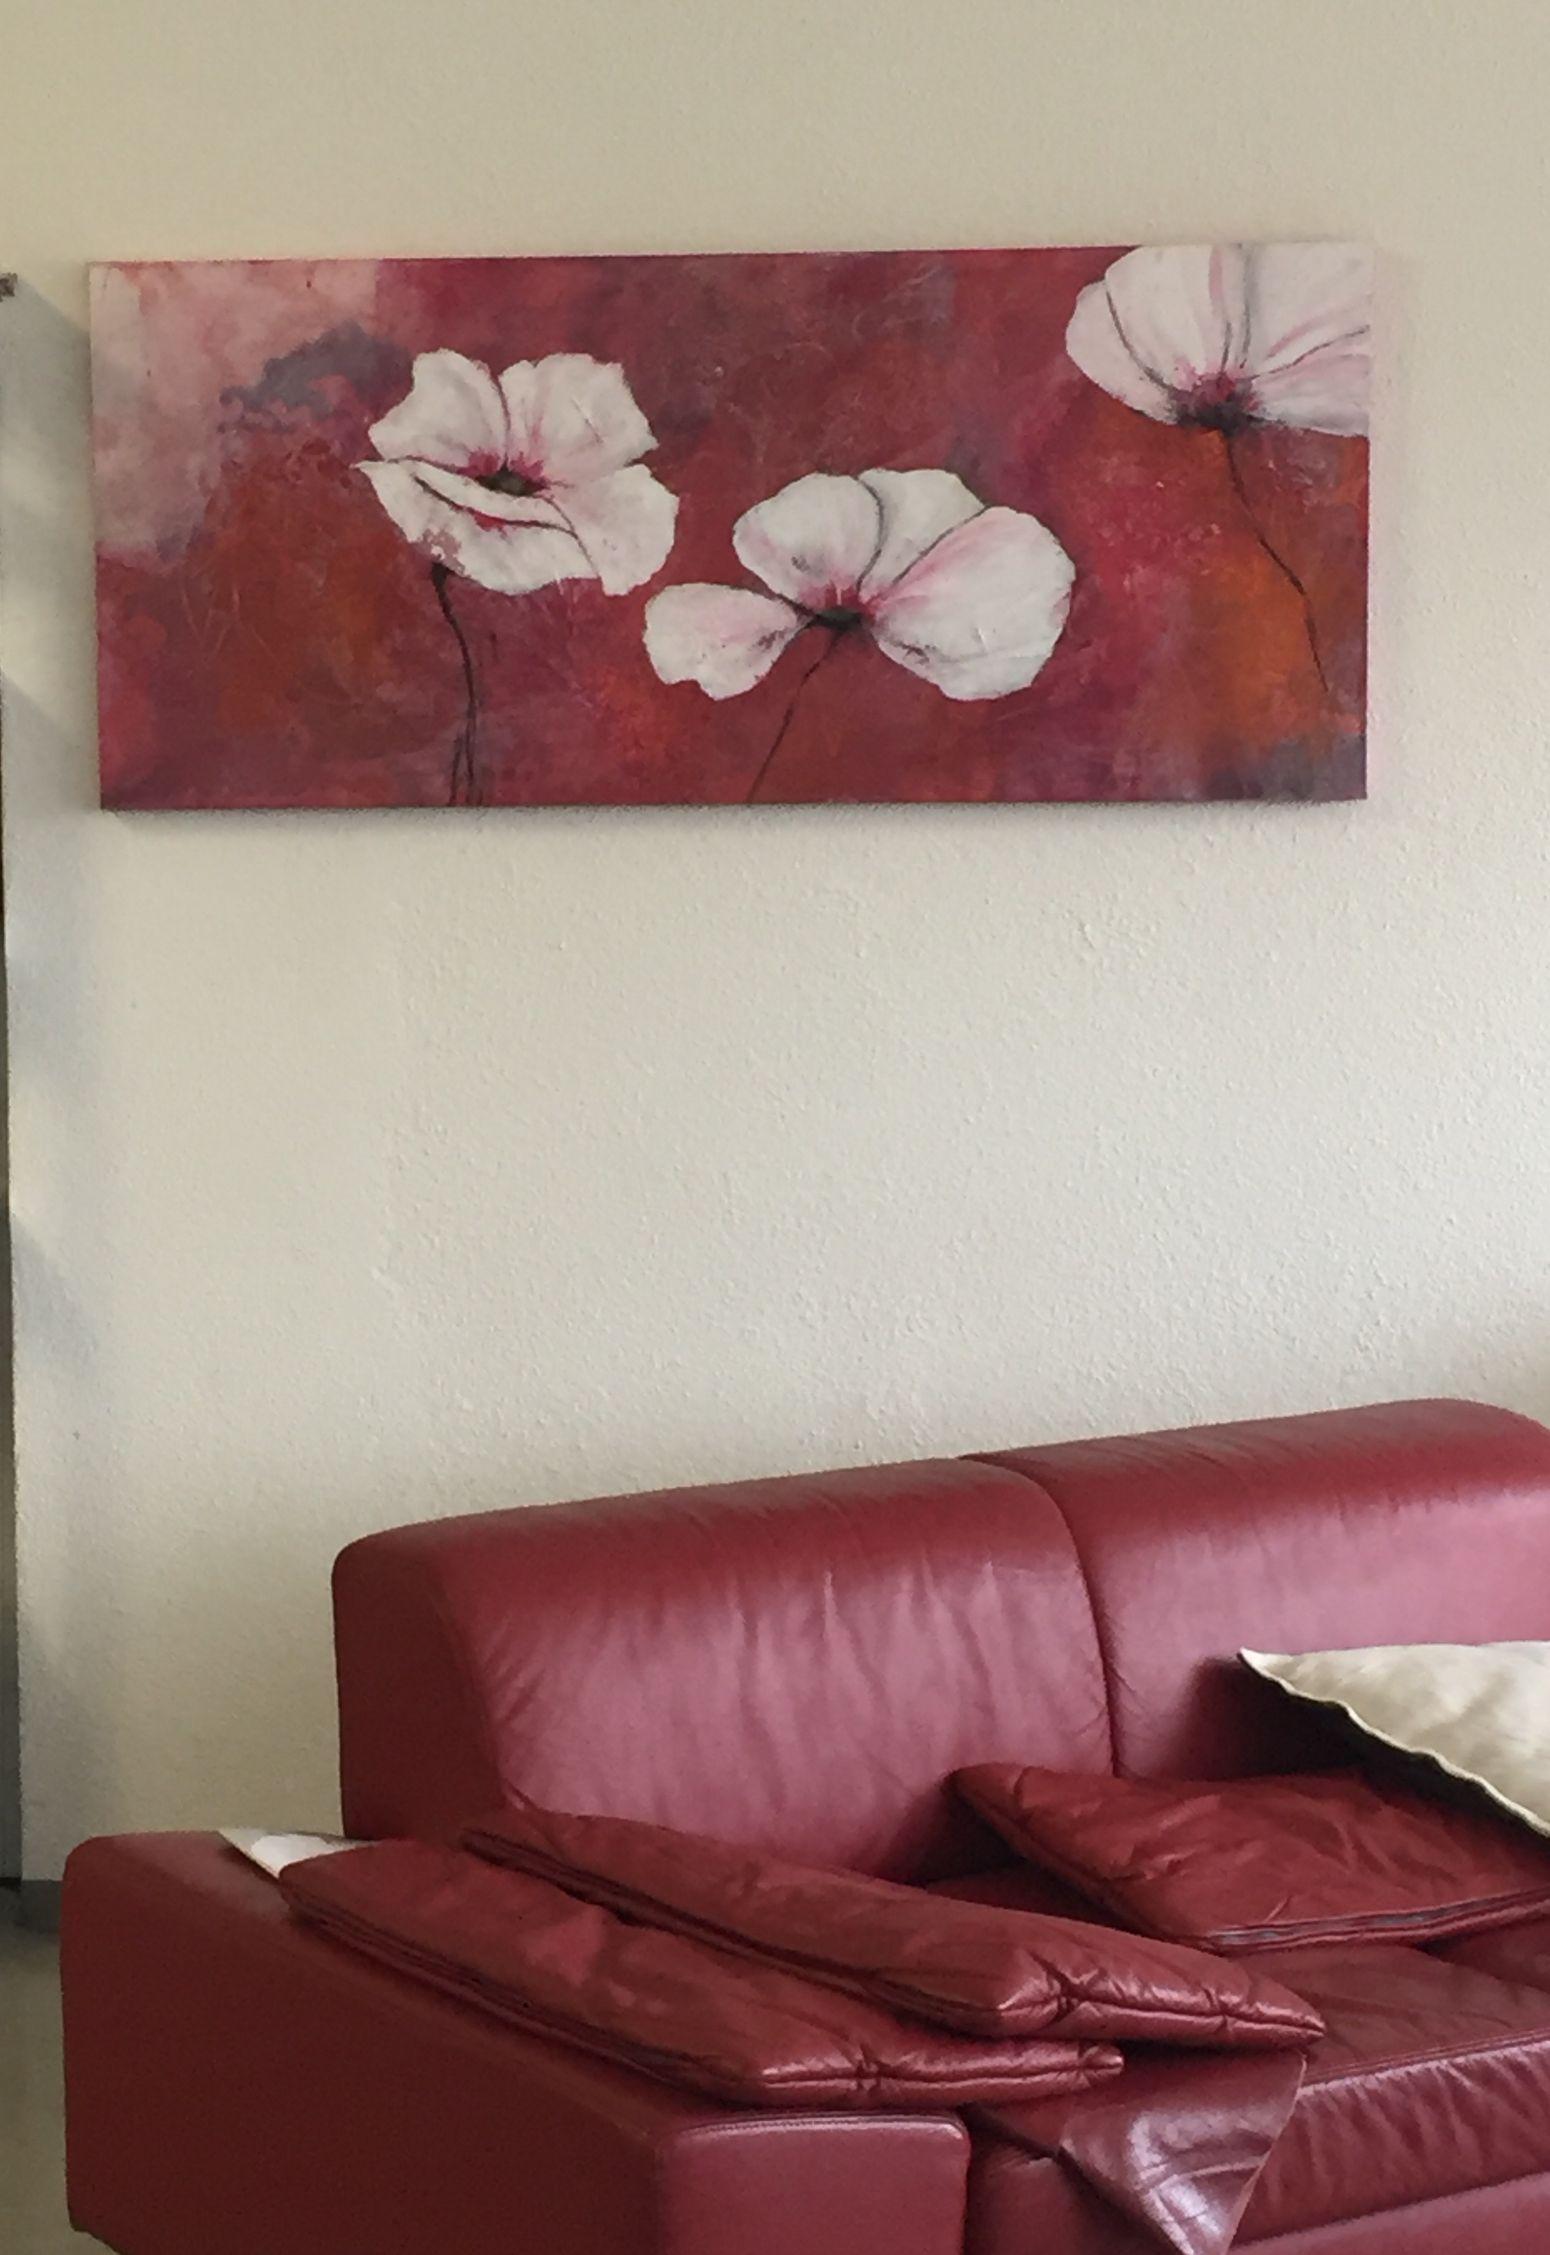 sofa mit passendem bild